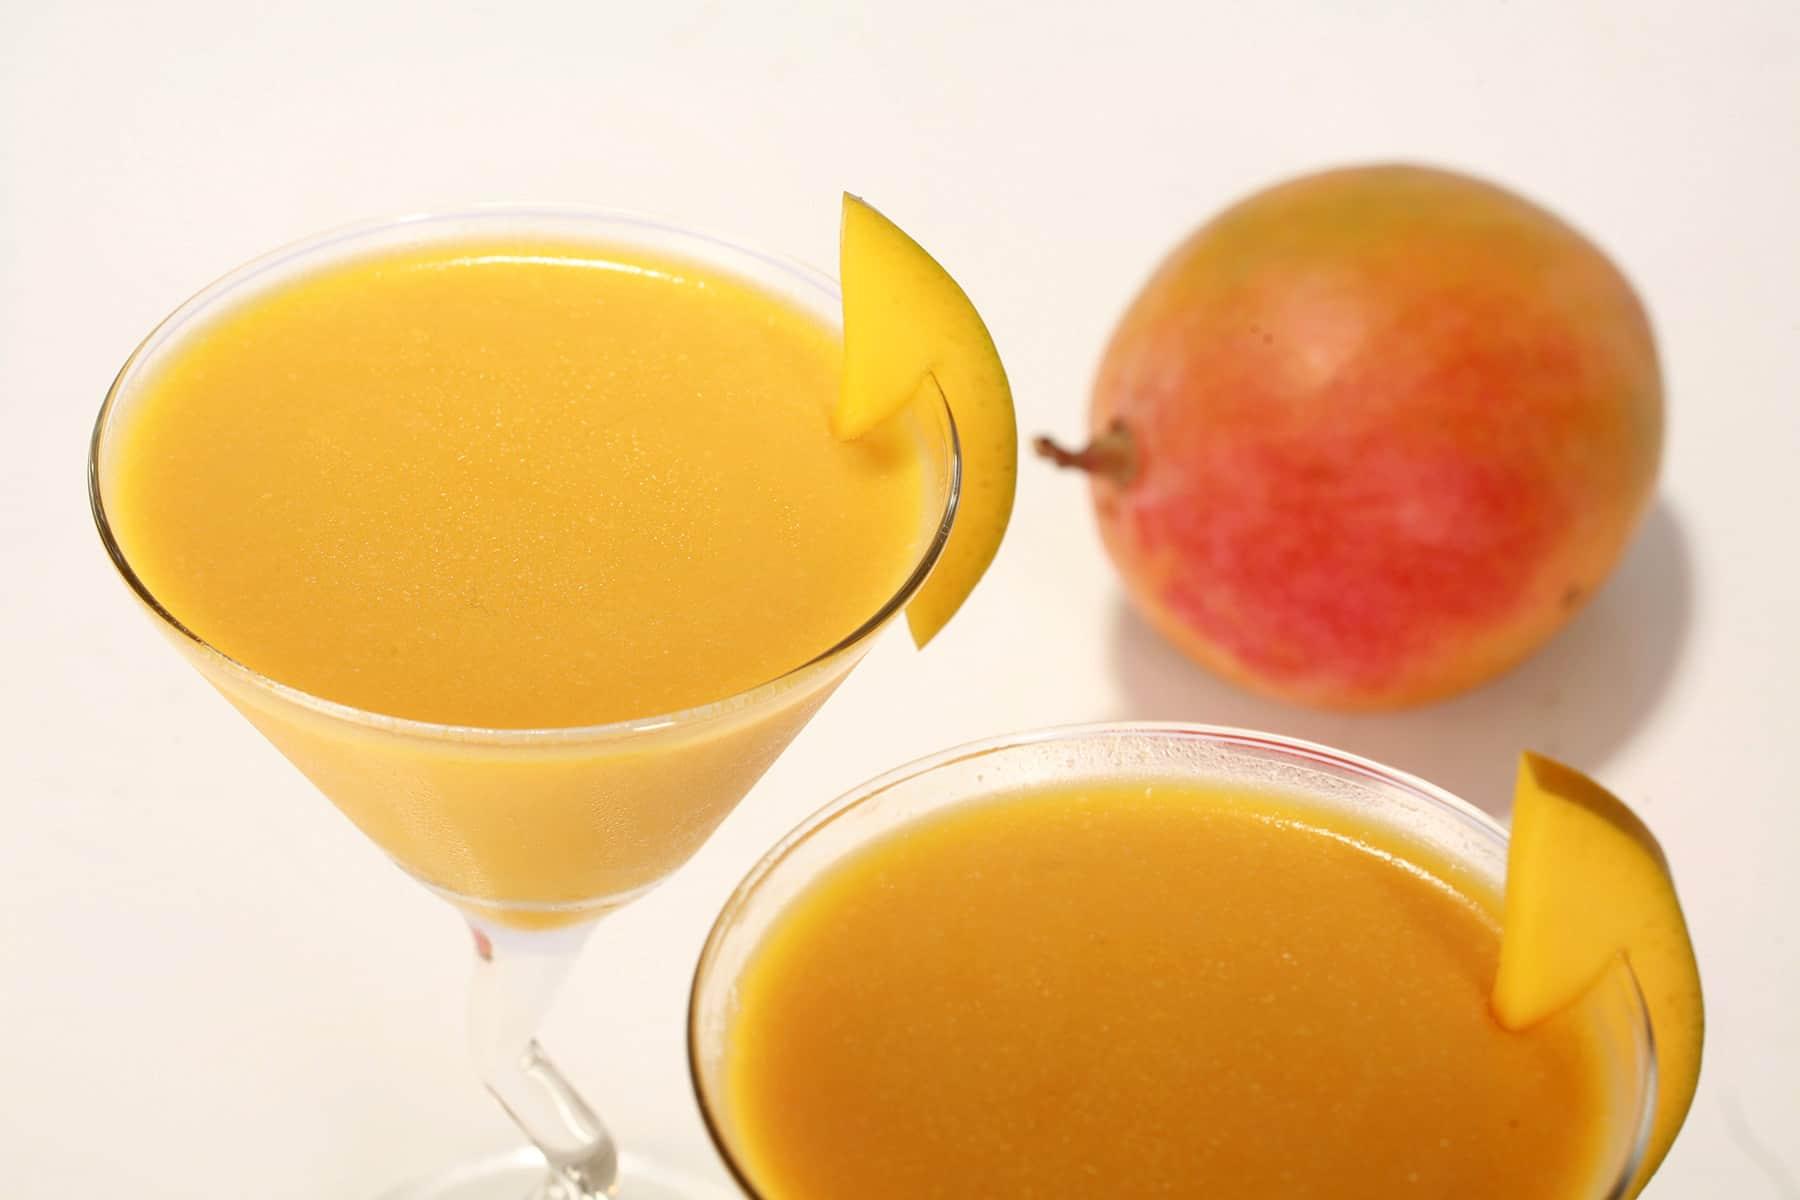 2 Mango daiquiri panna cottas, with a whole fresh mango beside them.